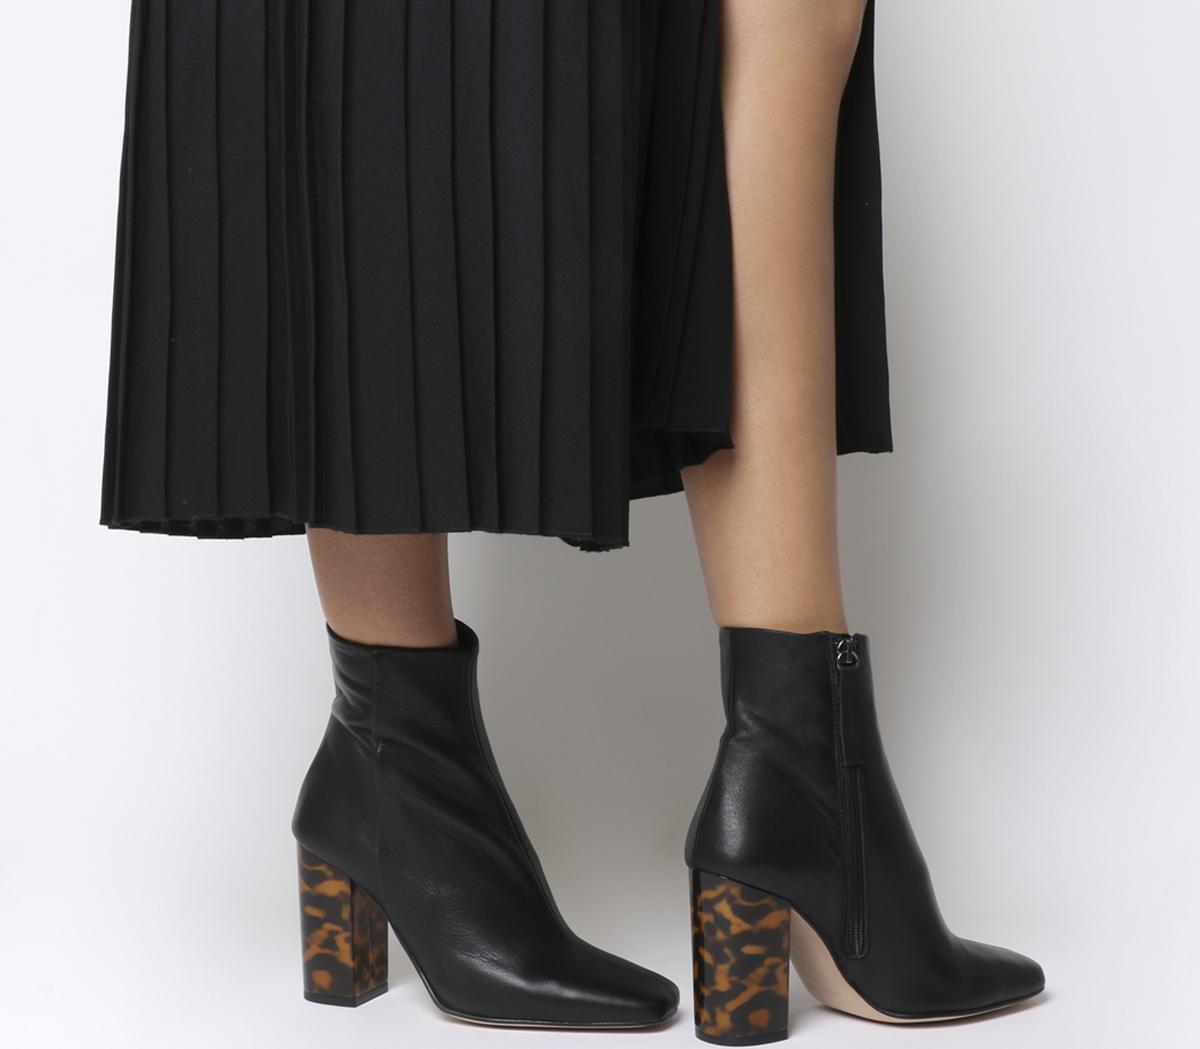 All Right Block Heel Boots